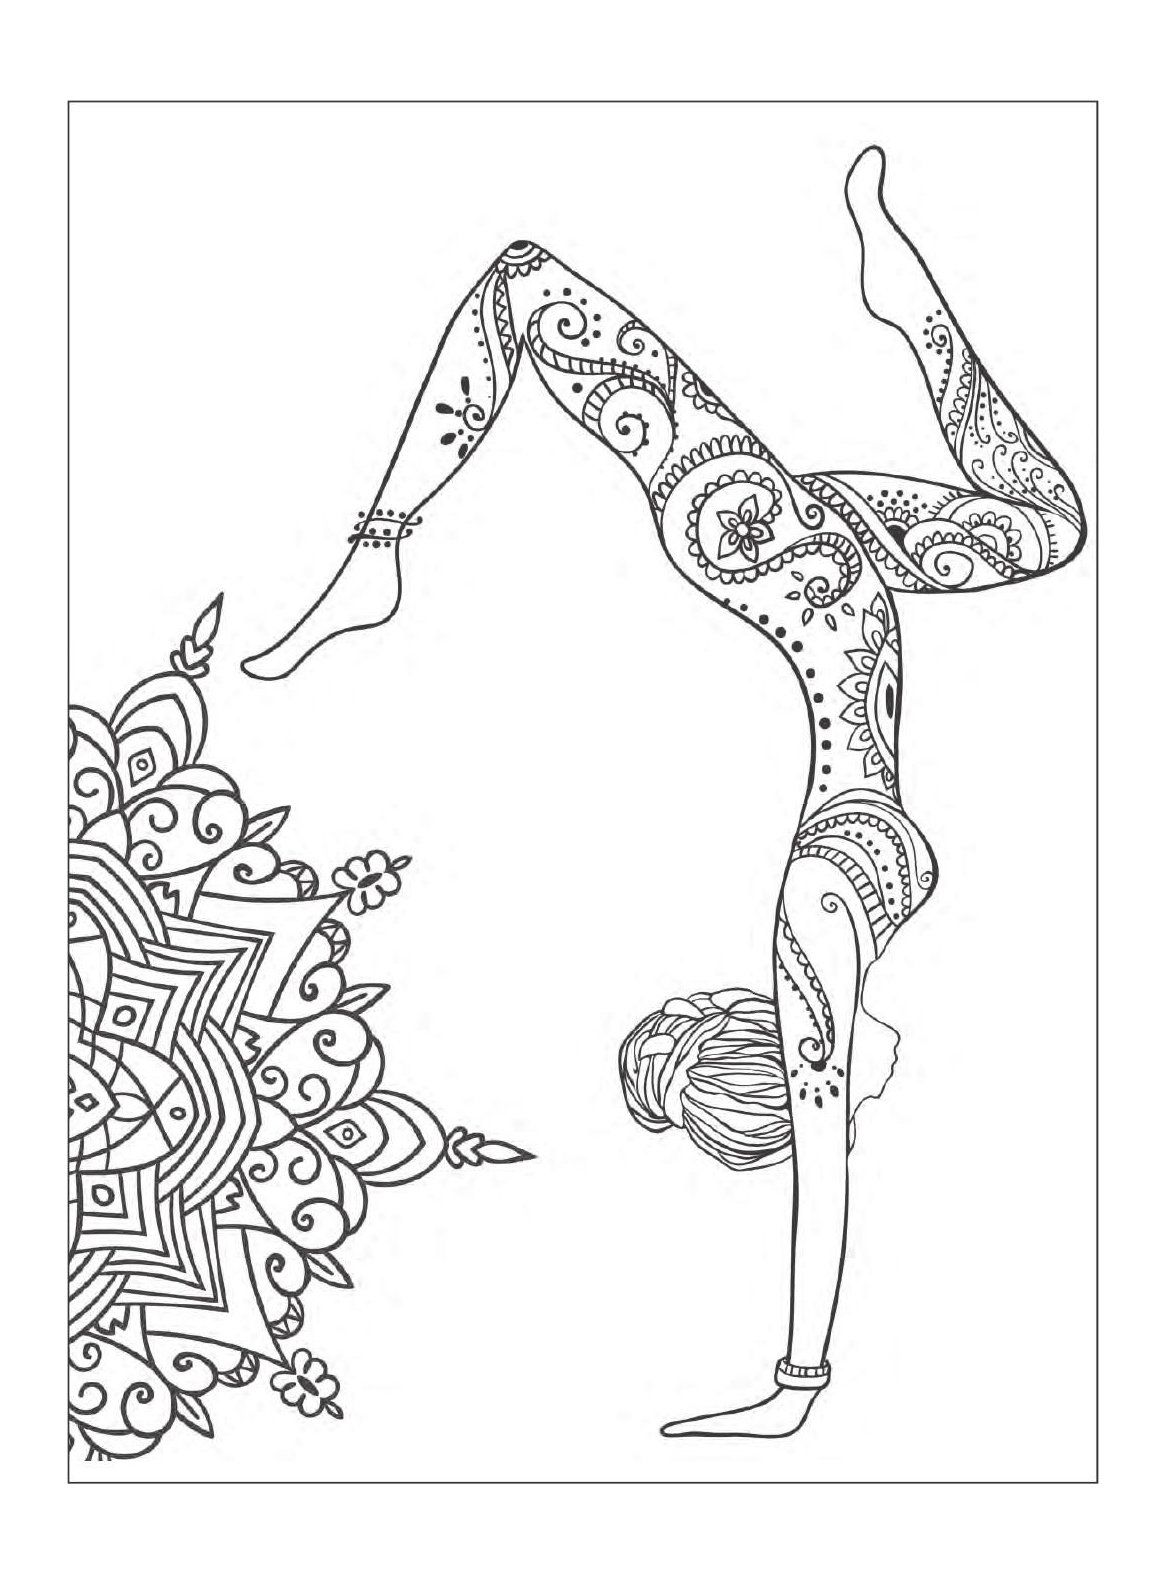 Yoga And Meditation Coloring Book For Adults With Yoga Poses And Mandalas Yoga Art Diy Yogaartdiy This I Mandala Art Therapy Dance Coloring Pages Yoga Art